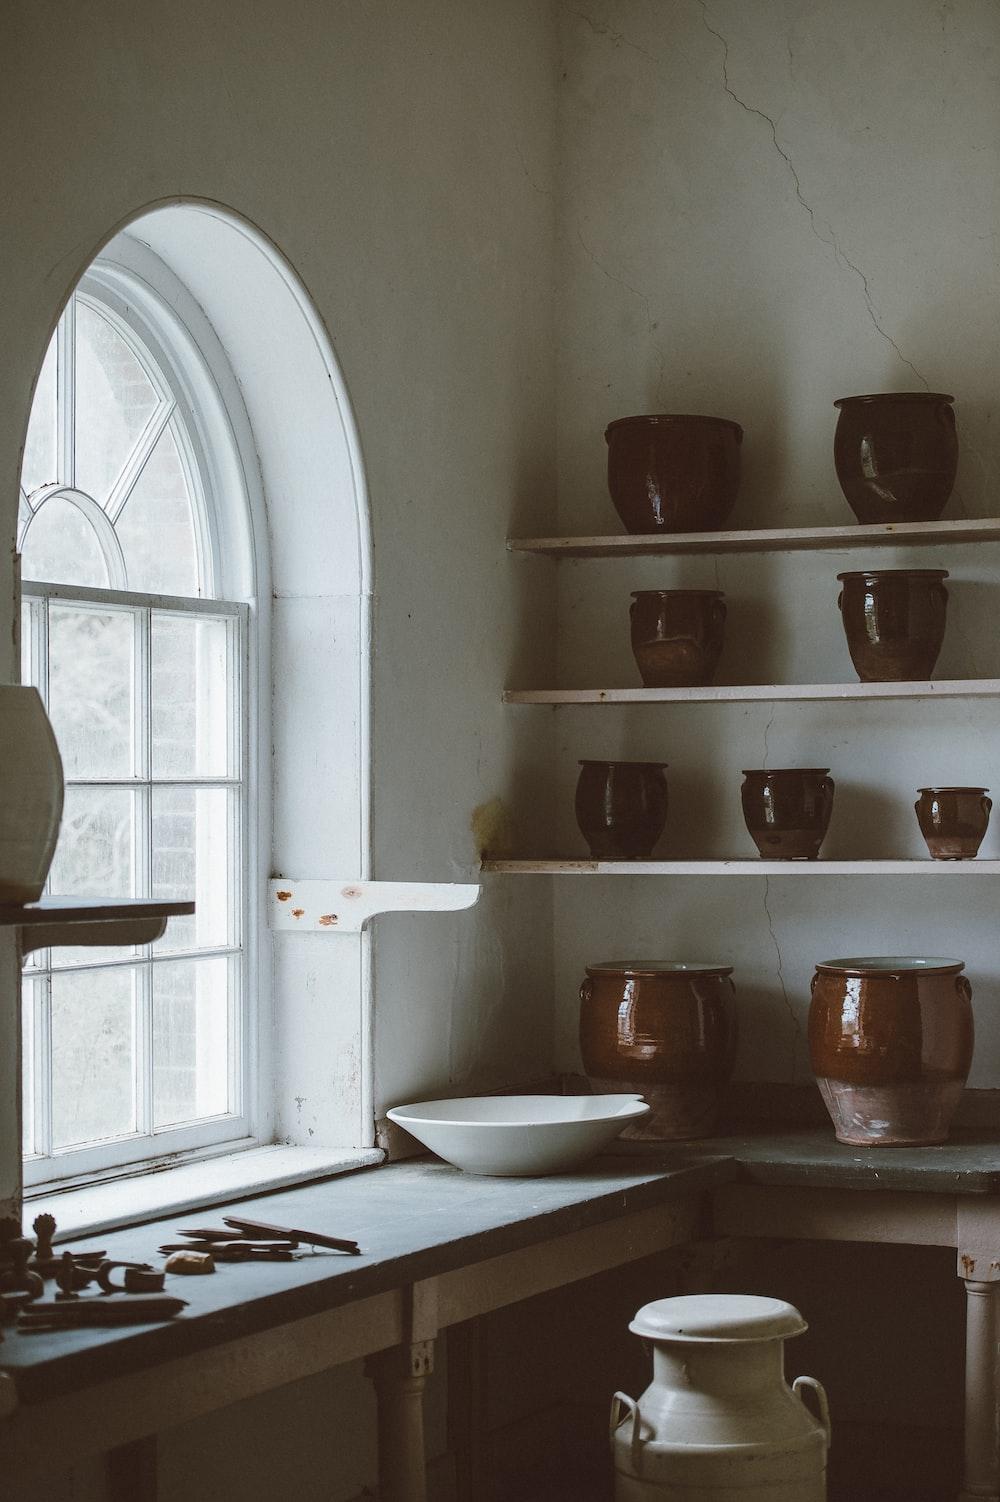 white ceramic bowl beside glass window